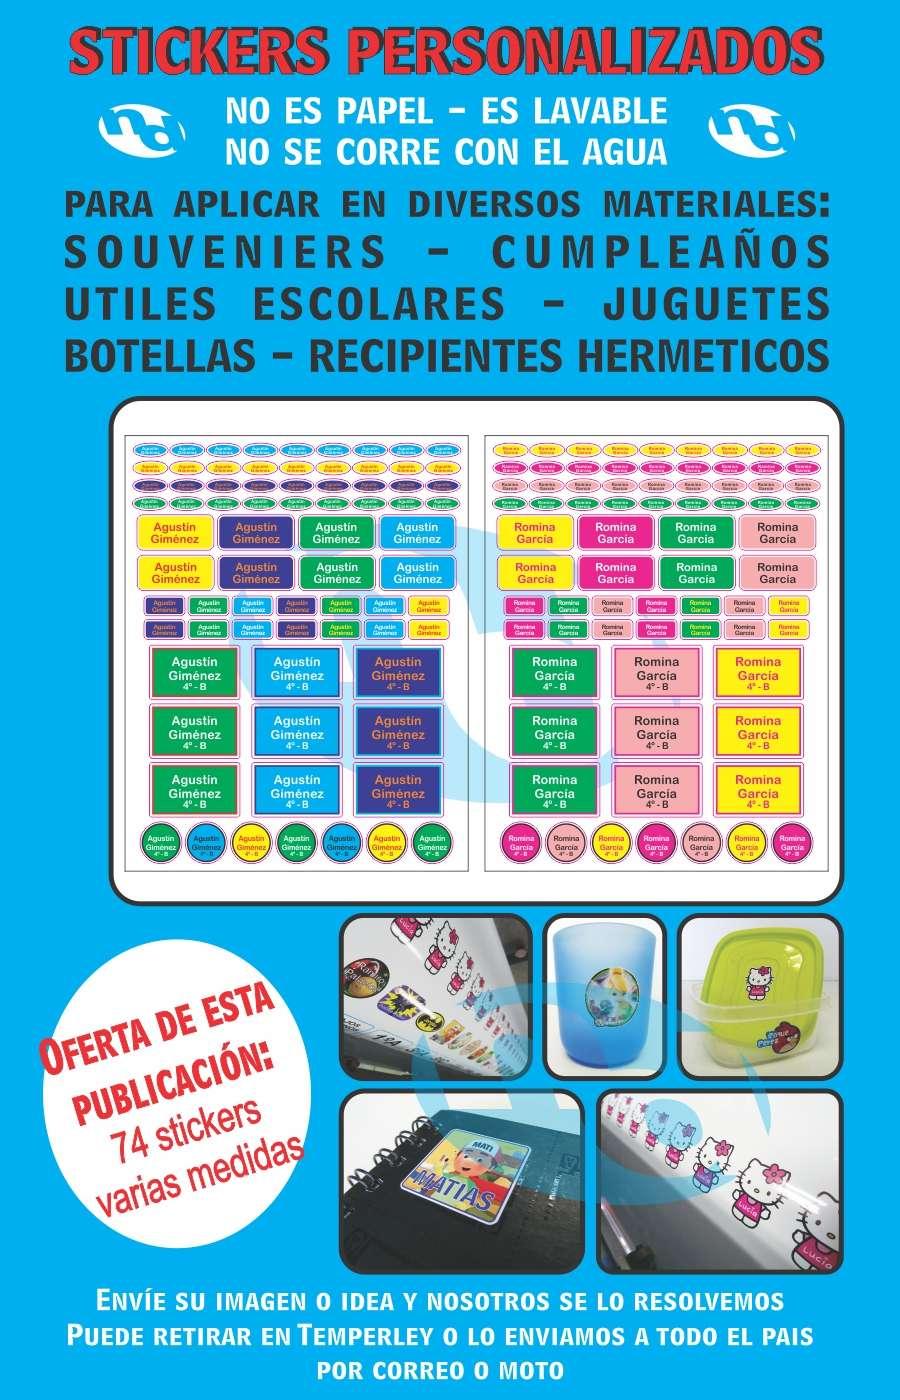 Stickers Etiquetas Utiles Escolares Personalizados